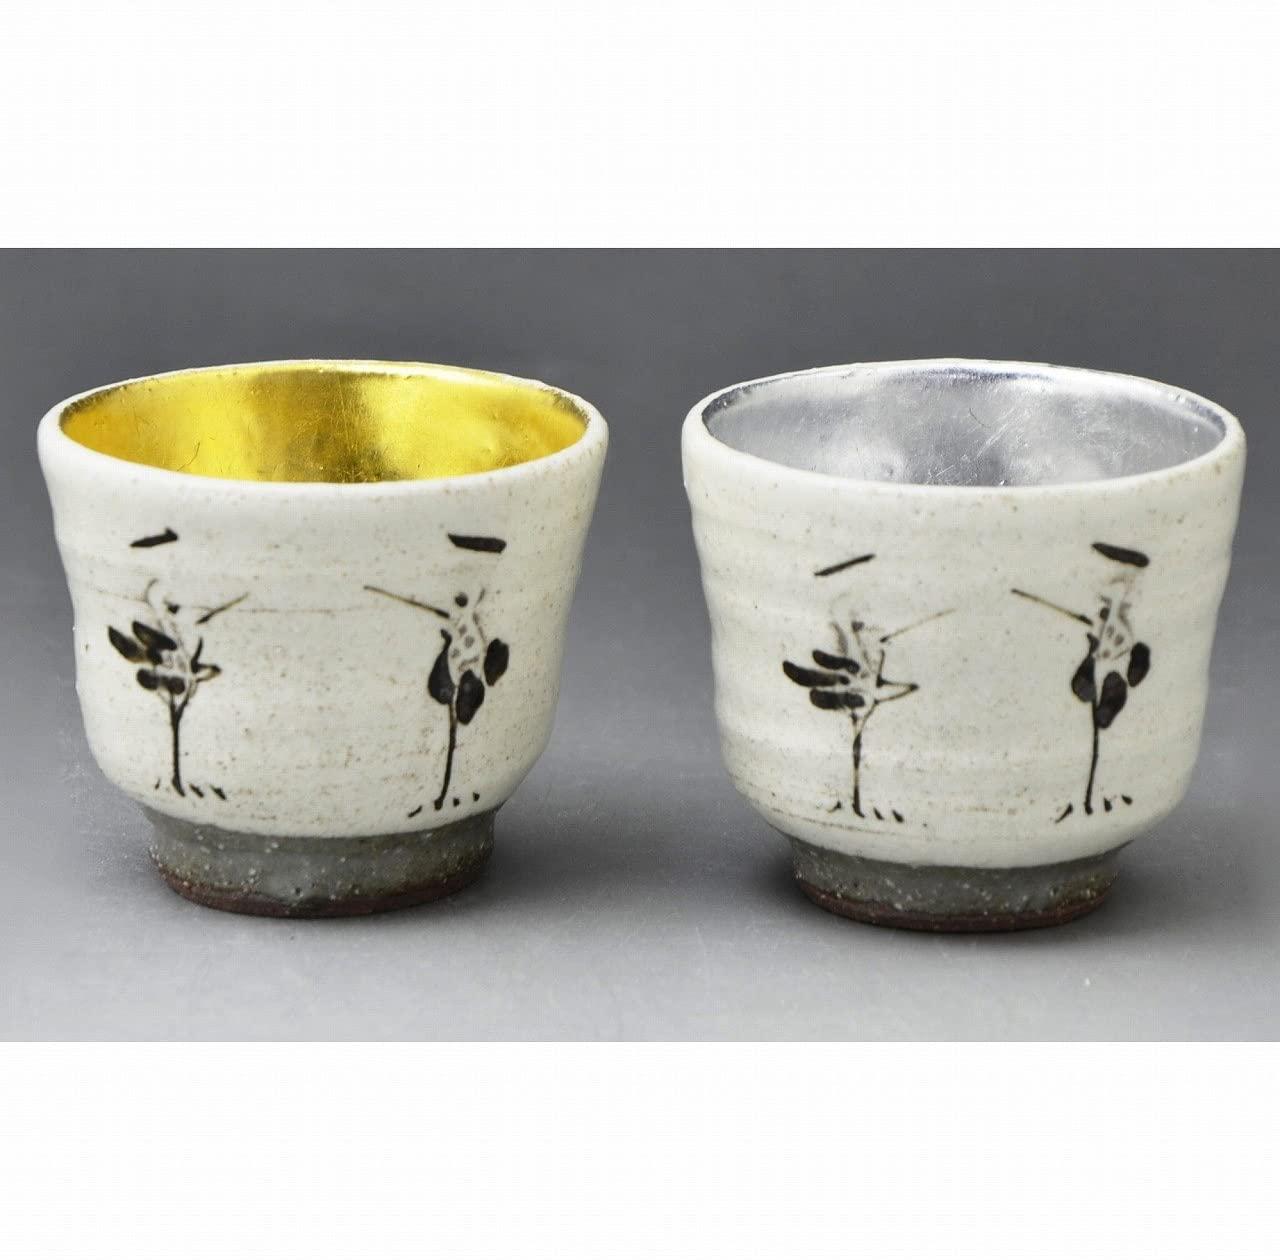 Kiyomizu-kyo yaki ware. Set of 2 Japanese Sake guinomi cups gold and silver crane with wooden box. Ceramic. kymz-GMV079